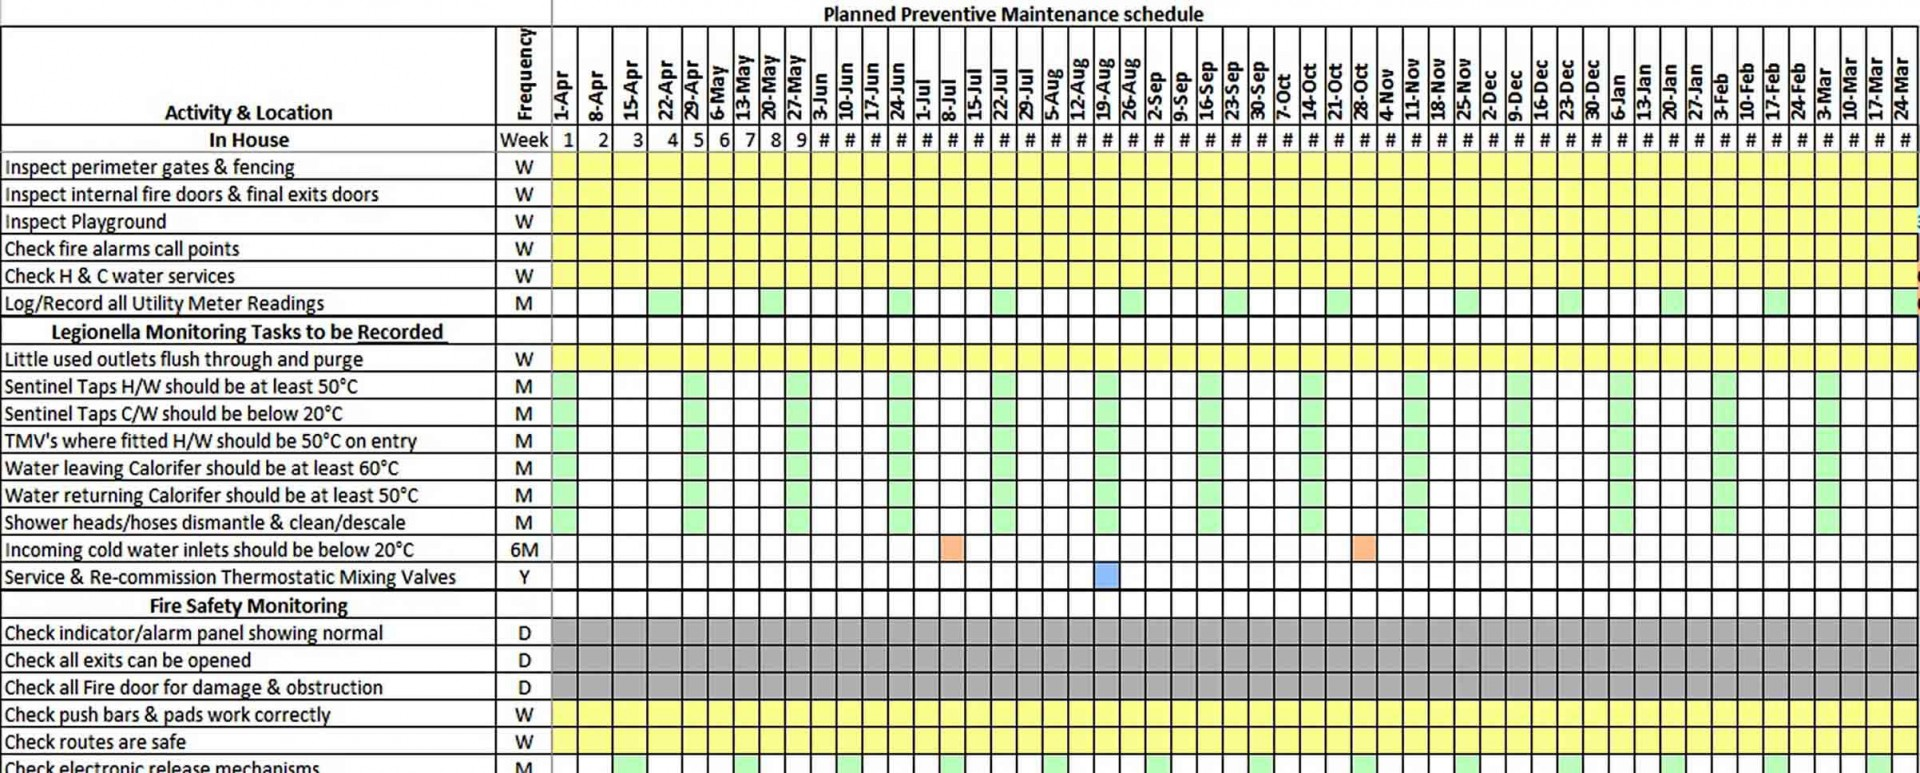 Preventive Maintenance Schedule Template Excel Addictionary